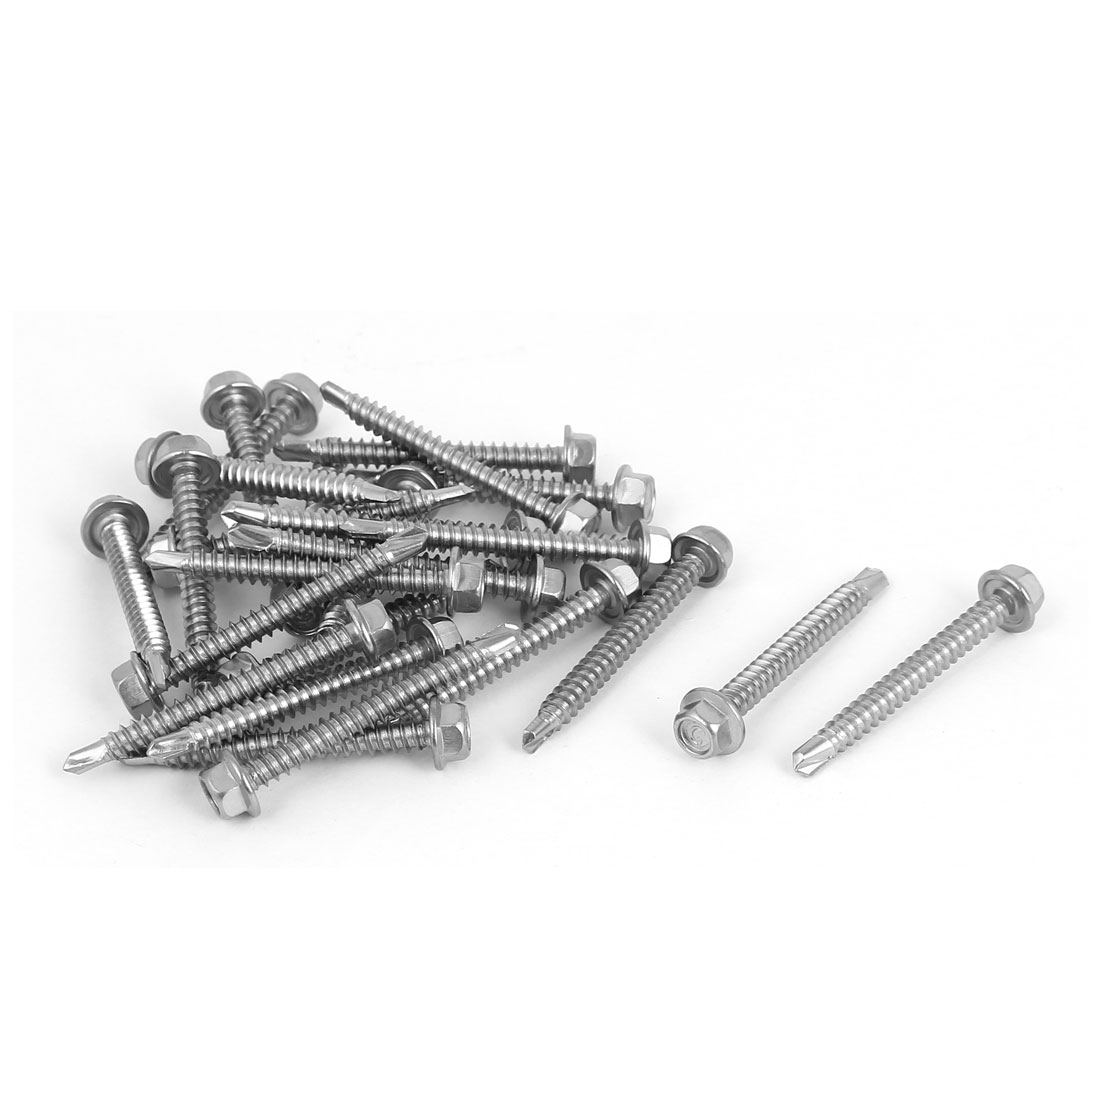 M4.2 x 38mm Thread 410 Stainless Steel Hex Head Self Drilling Screws 25 Pcs